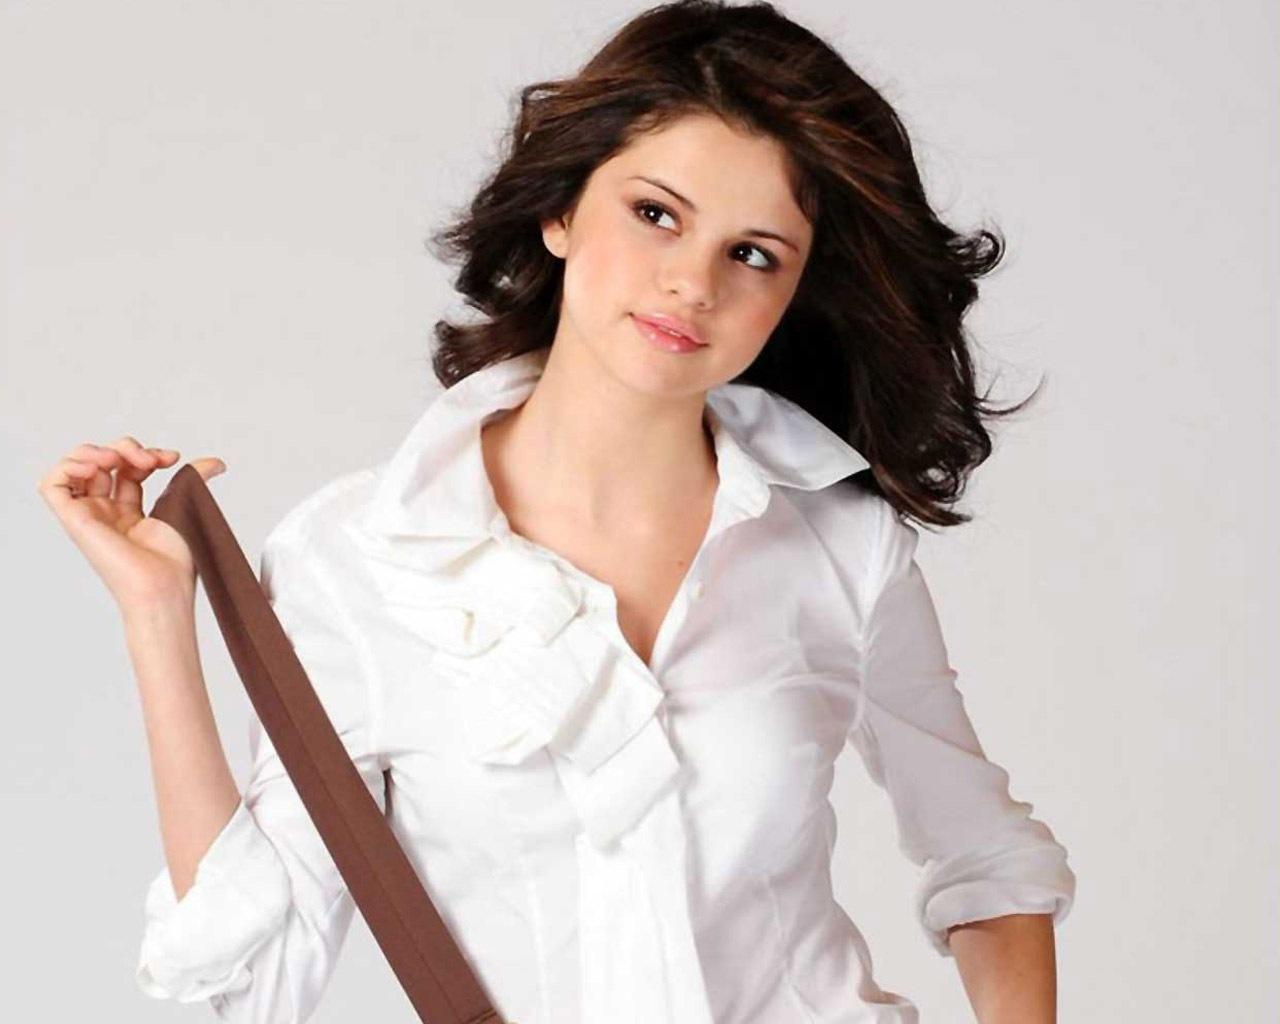 http://1.bp.blogspot.com/-XiLqMamc7NA/UFTxd8Y1iEI/AAAAAAAAB_U/jokGn7QcDhQ/s1600/Selena+Gomez+HD+Wallpaper+2012-2013+19.jpg